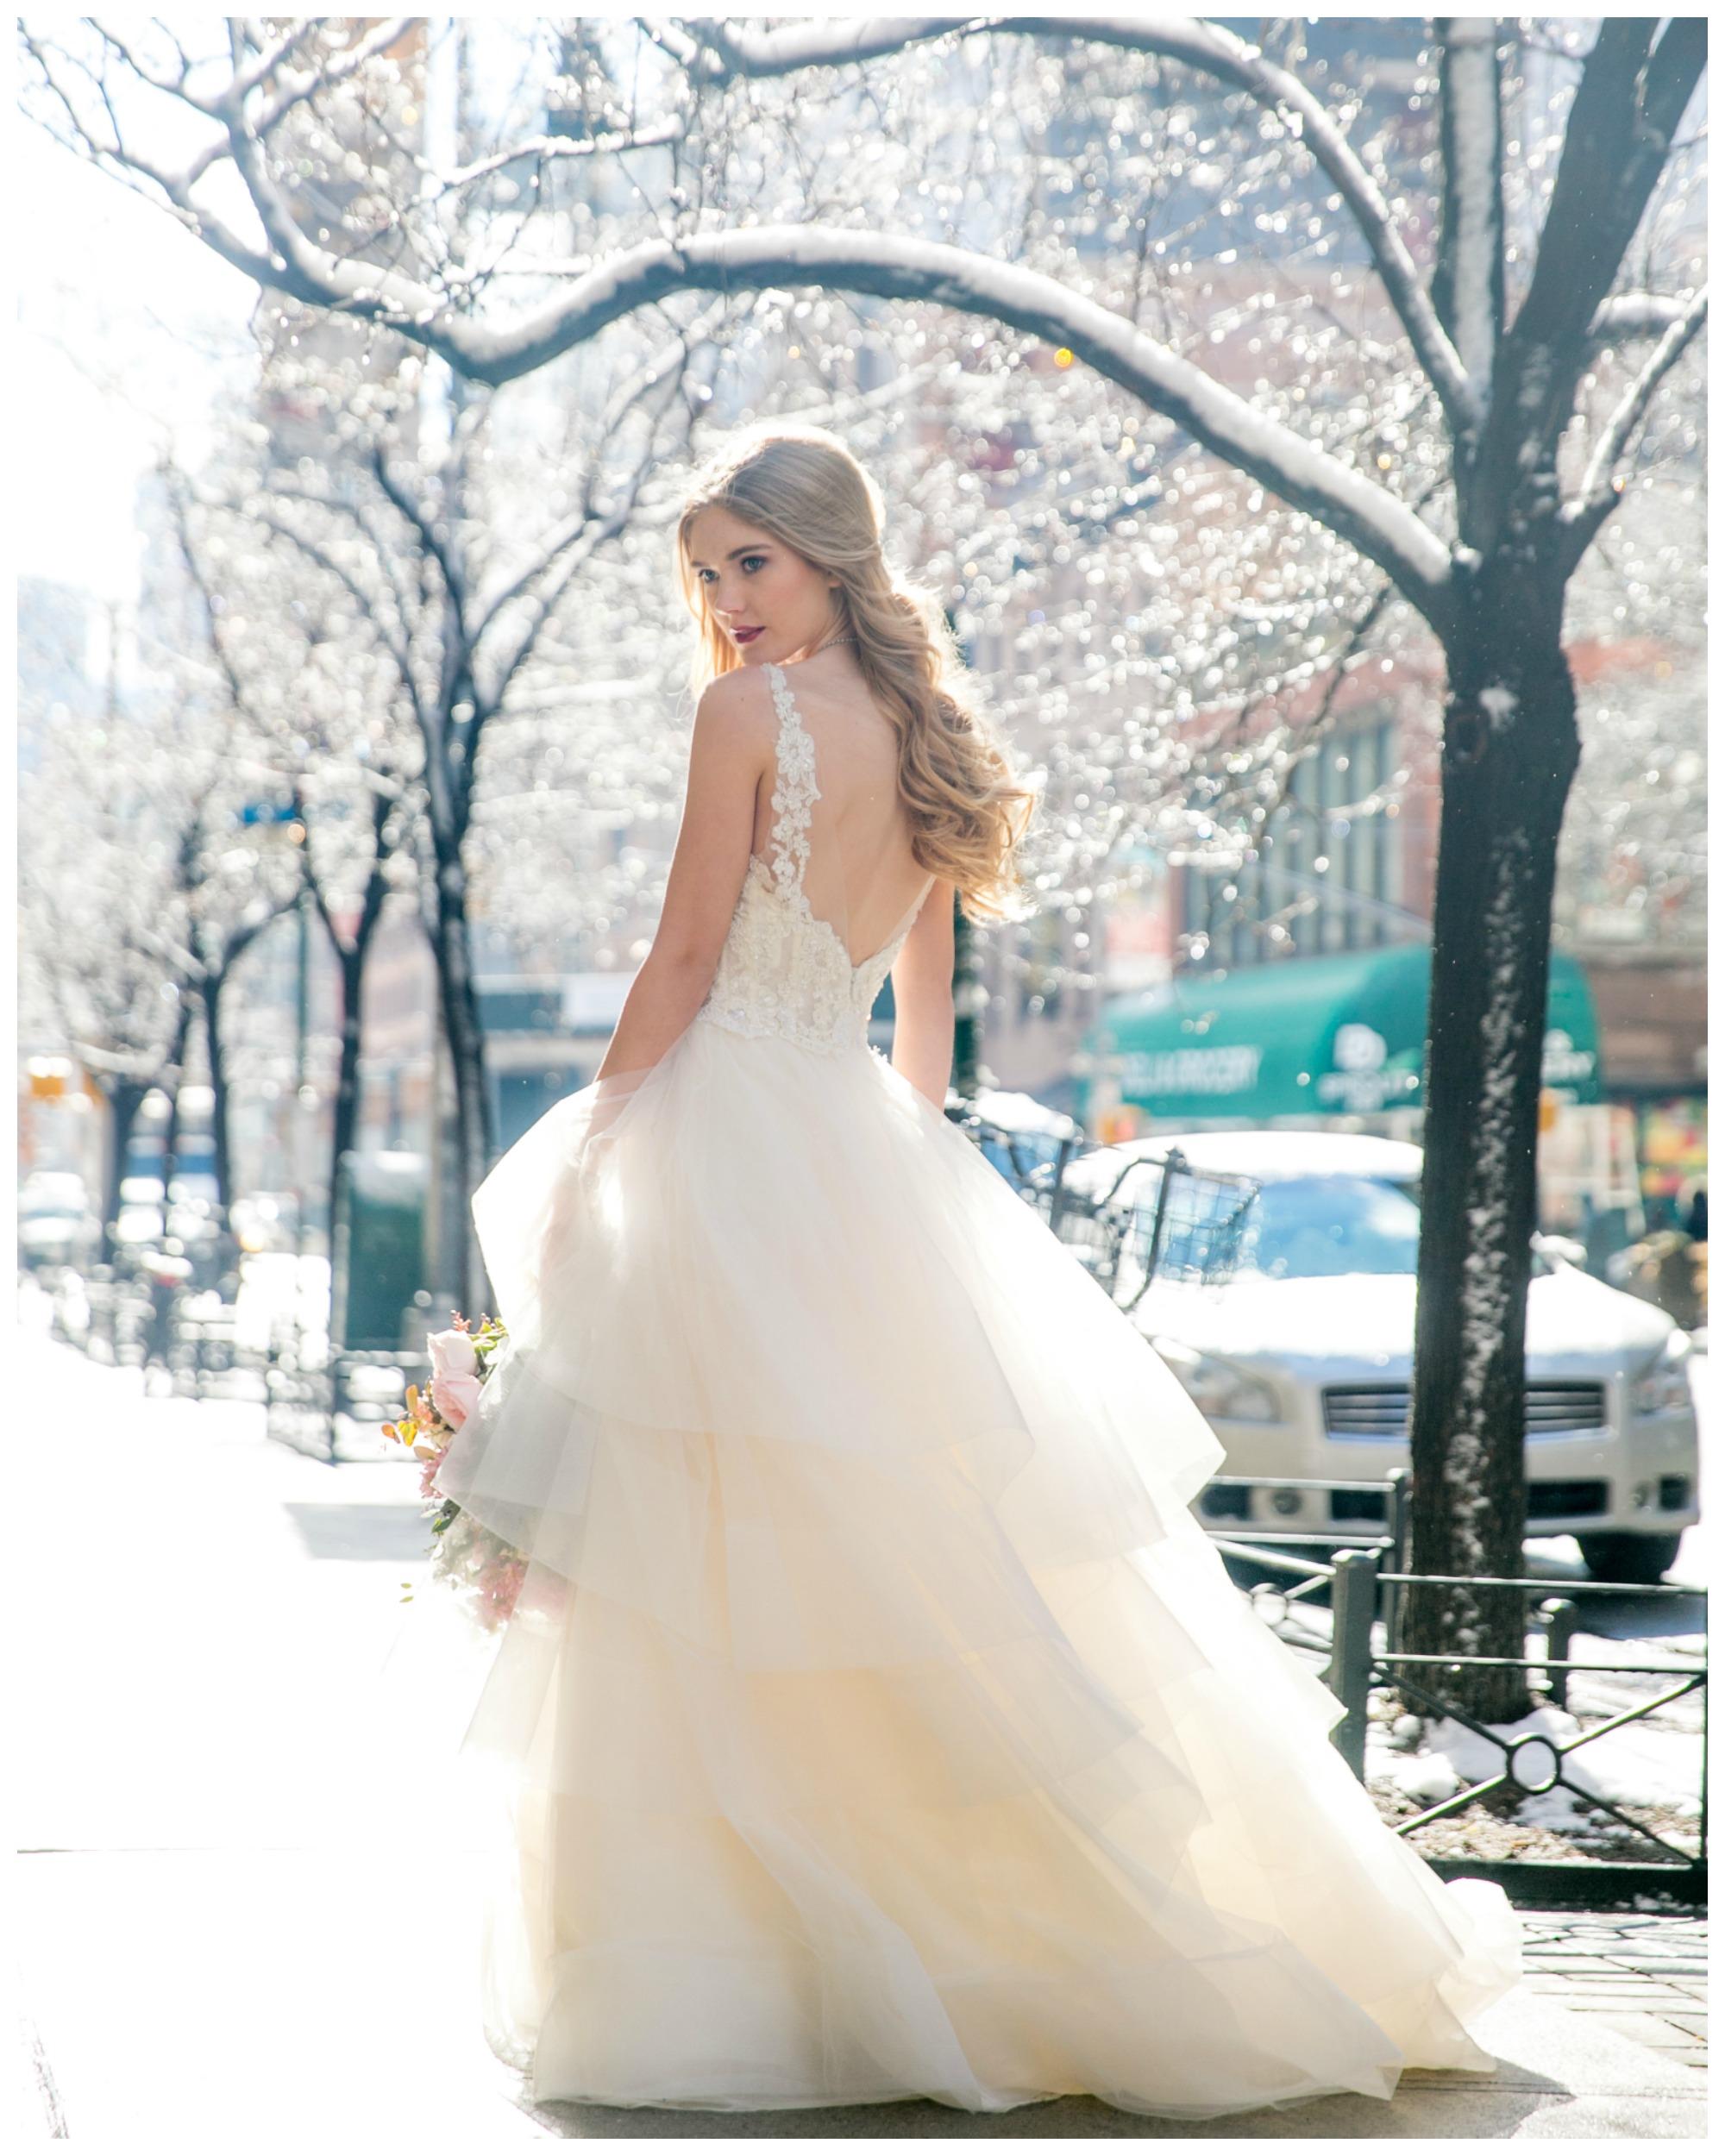 Bride on a snowy street in New York City